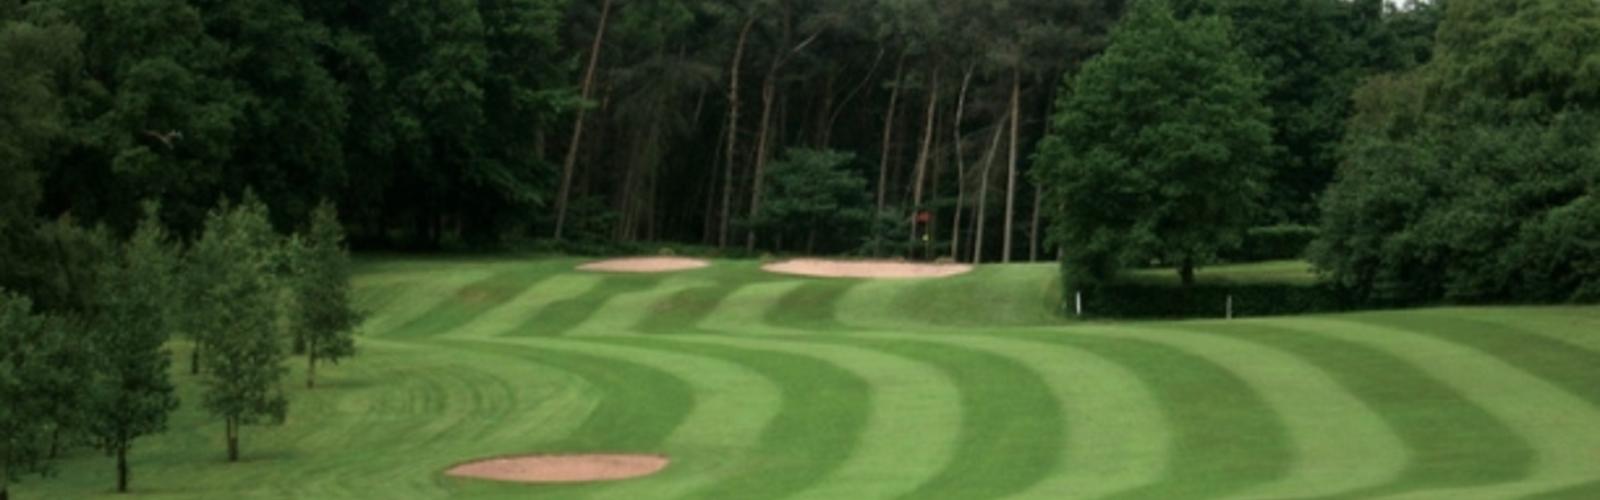 Market drayton golf club 2